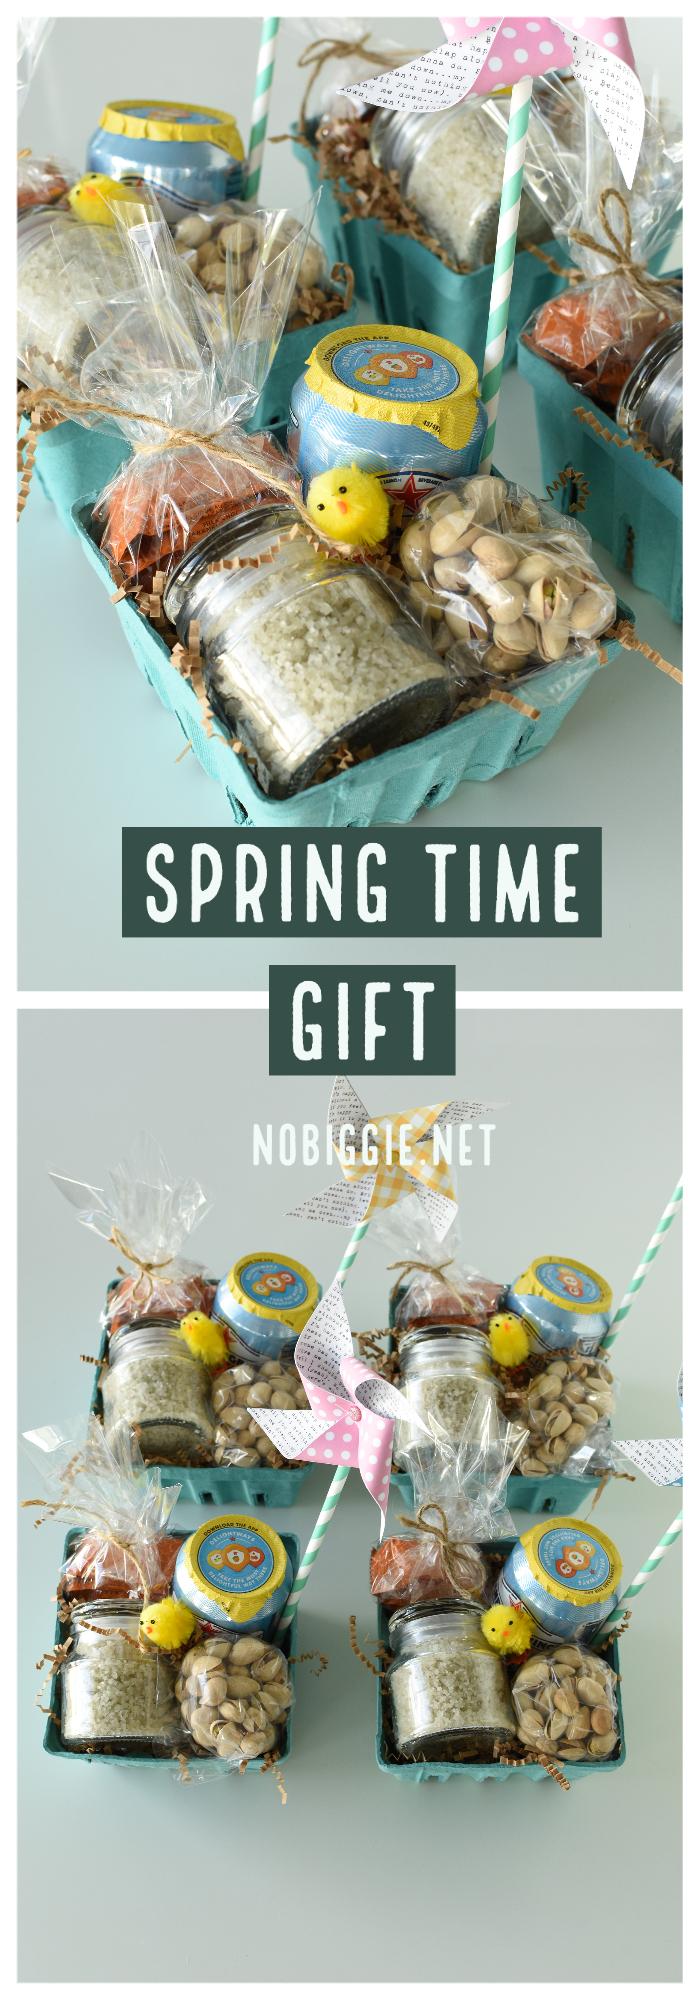 Berry Basket Spring time gift   NoBiggie.net